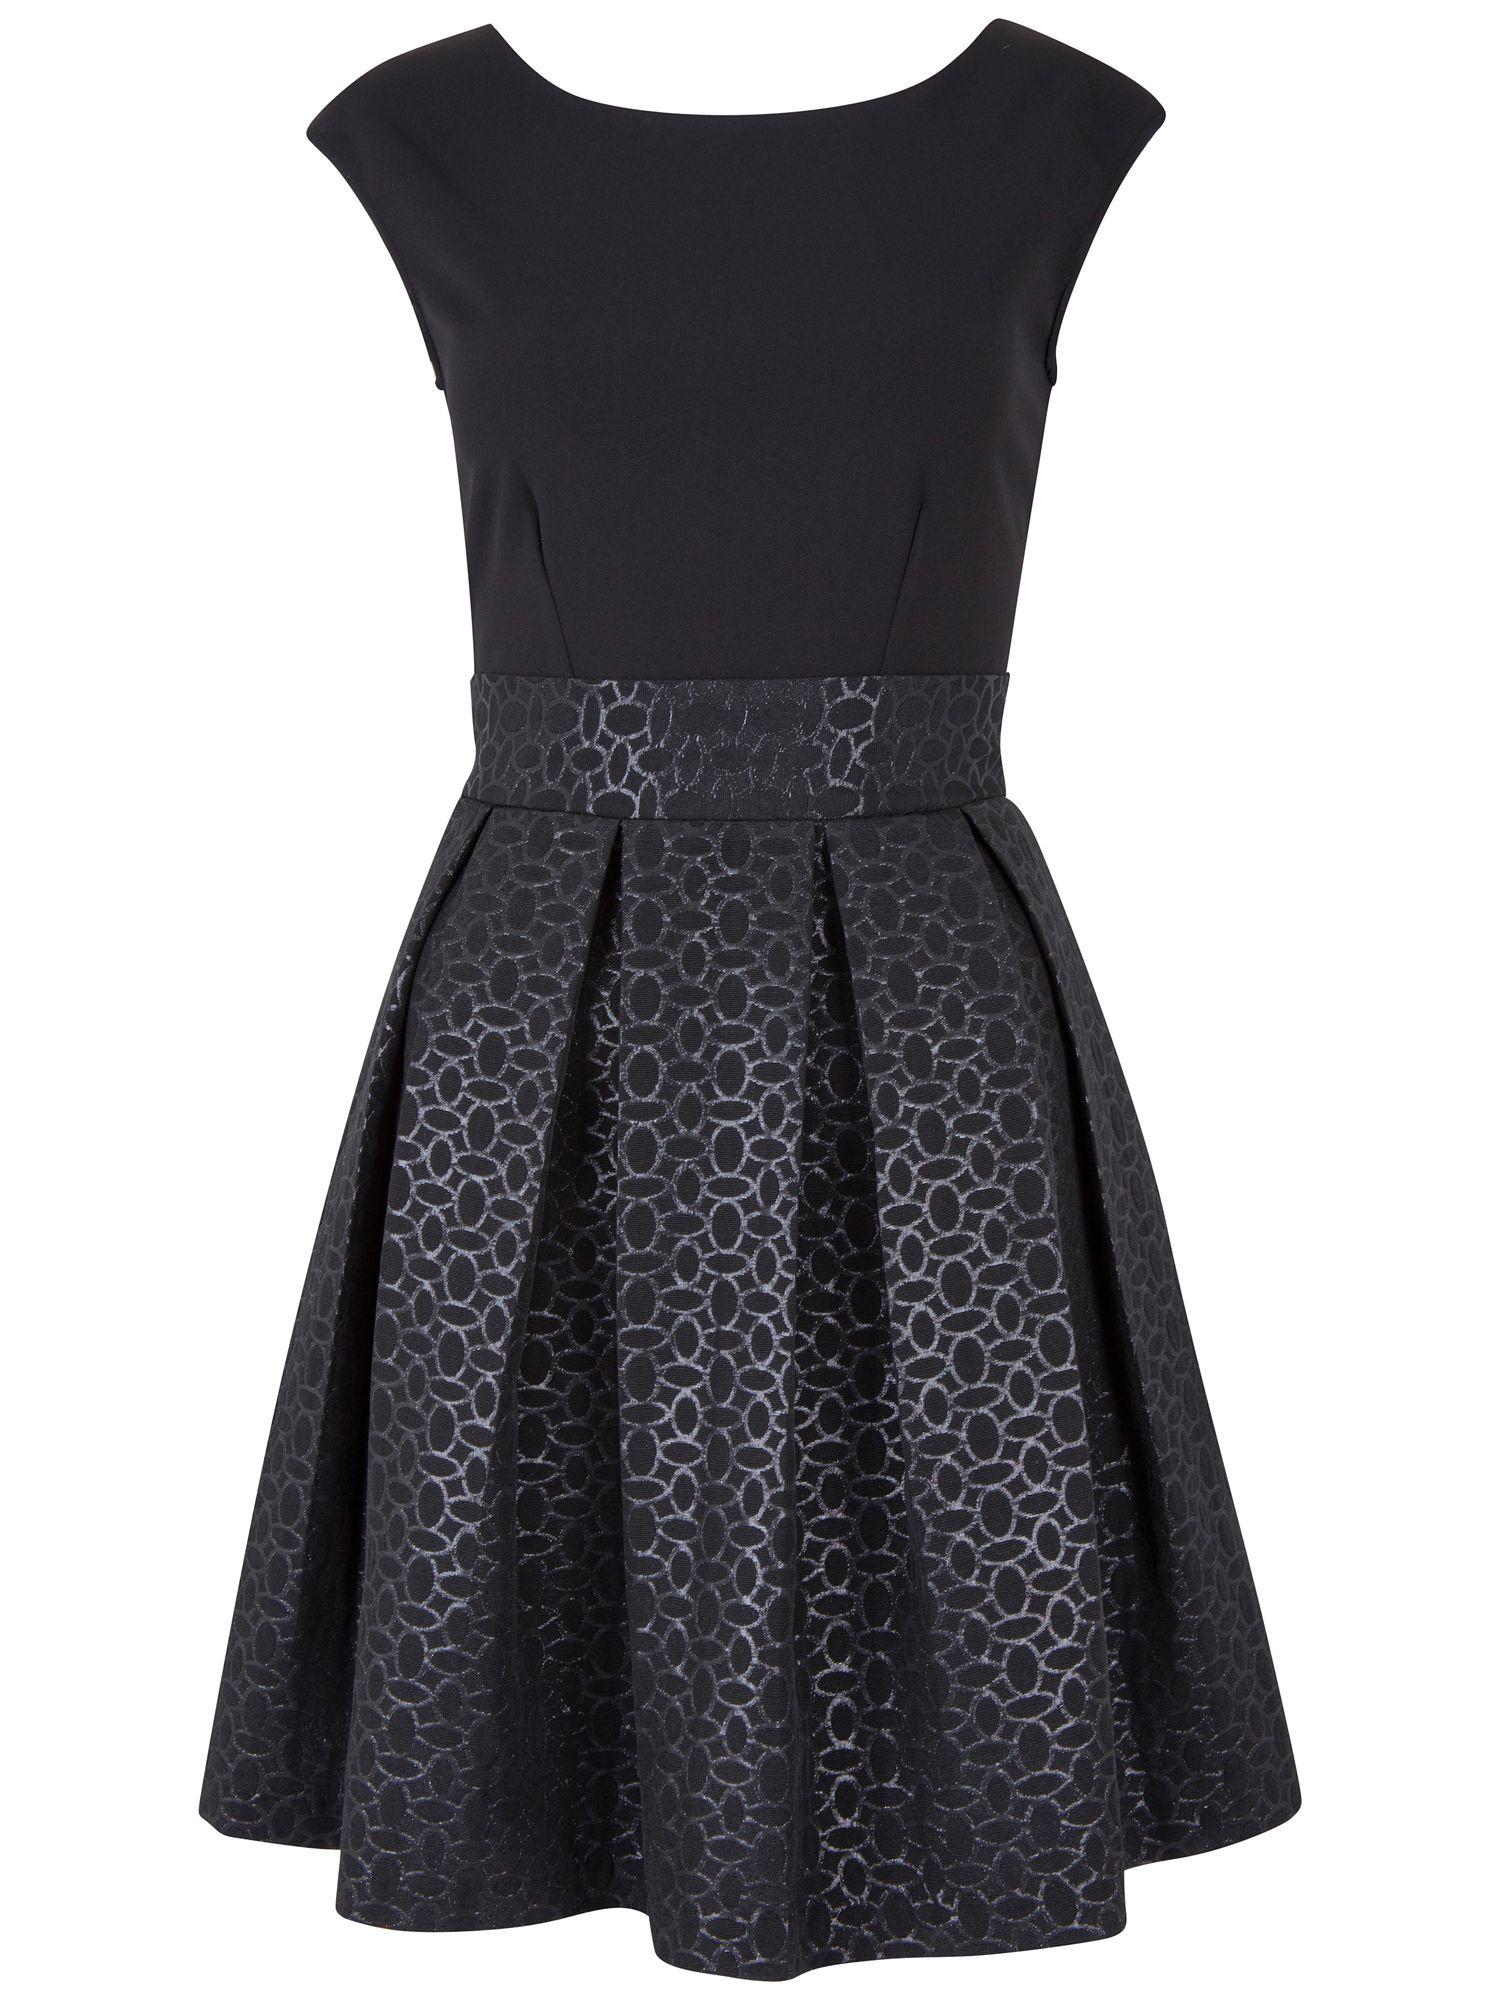 Popular Jacquard Patterned Skirt-Buy Cheap Jacquard ...